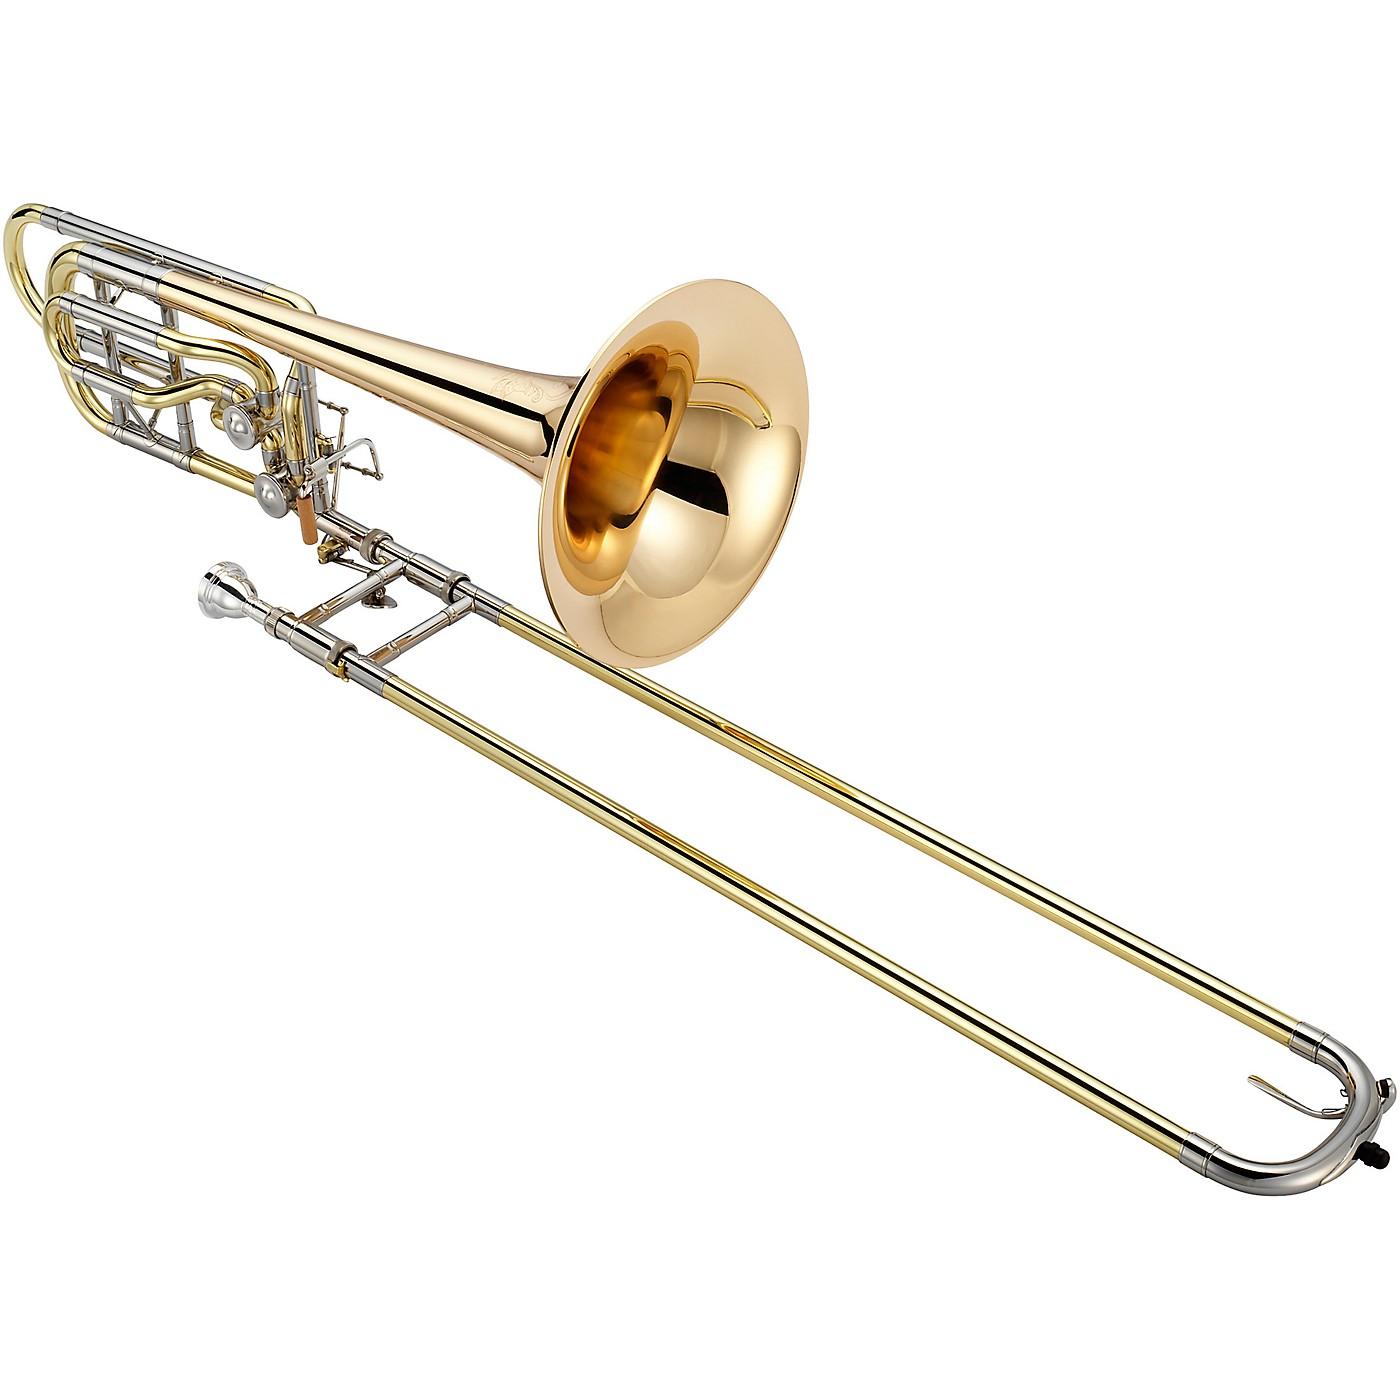 XO 1242 Professional Series Bass Trombone thumbnail